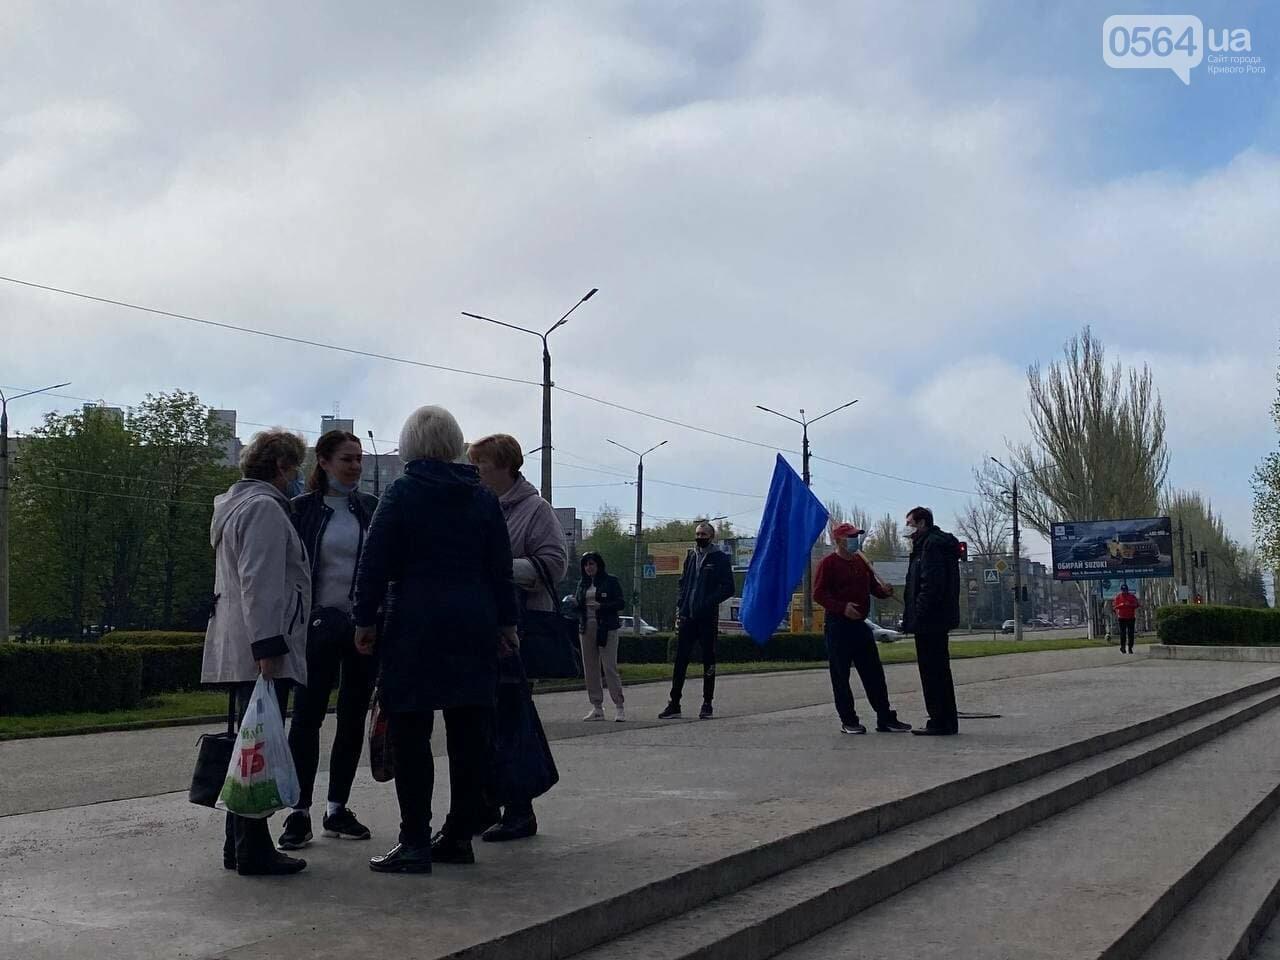 """Мир! Труд! Май!"", ""Зарплату 1000 евро!"", - криворожане вышли на первомайский марш, - ФОТО, ВИДЕО , фото-9"